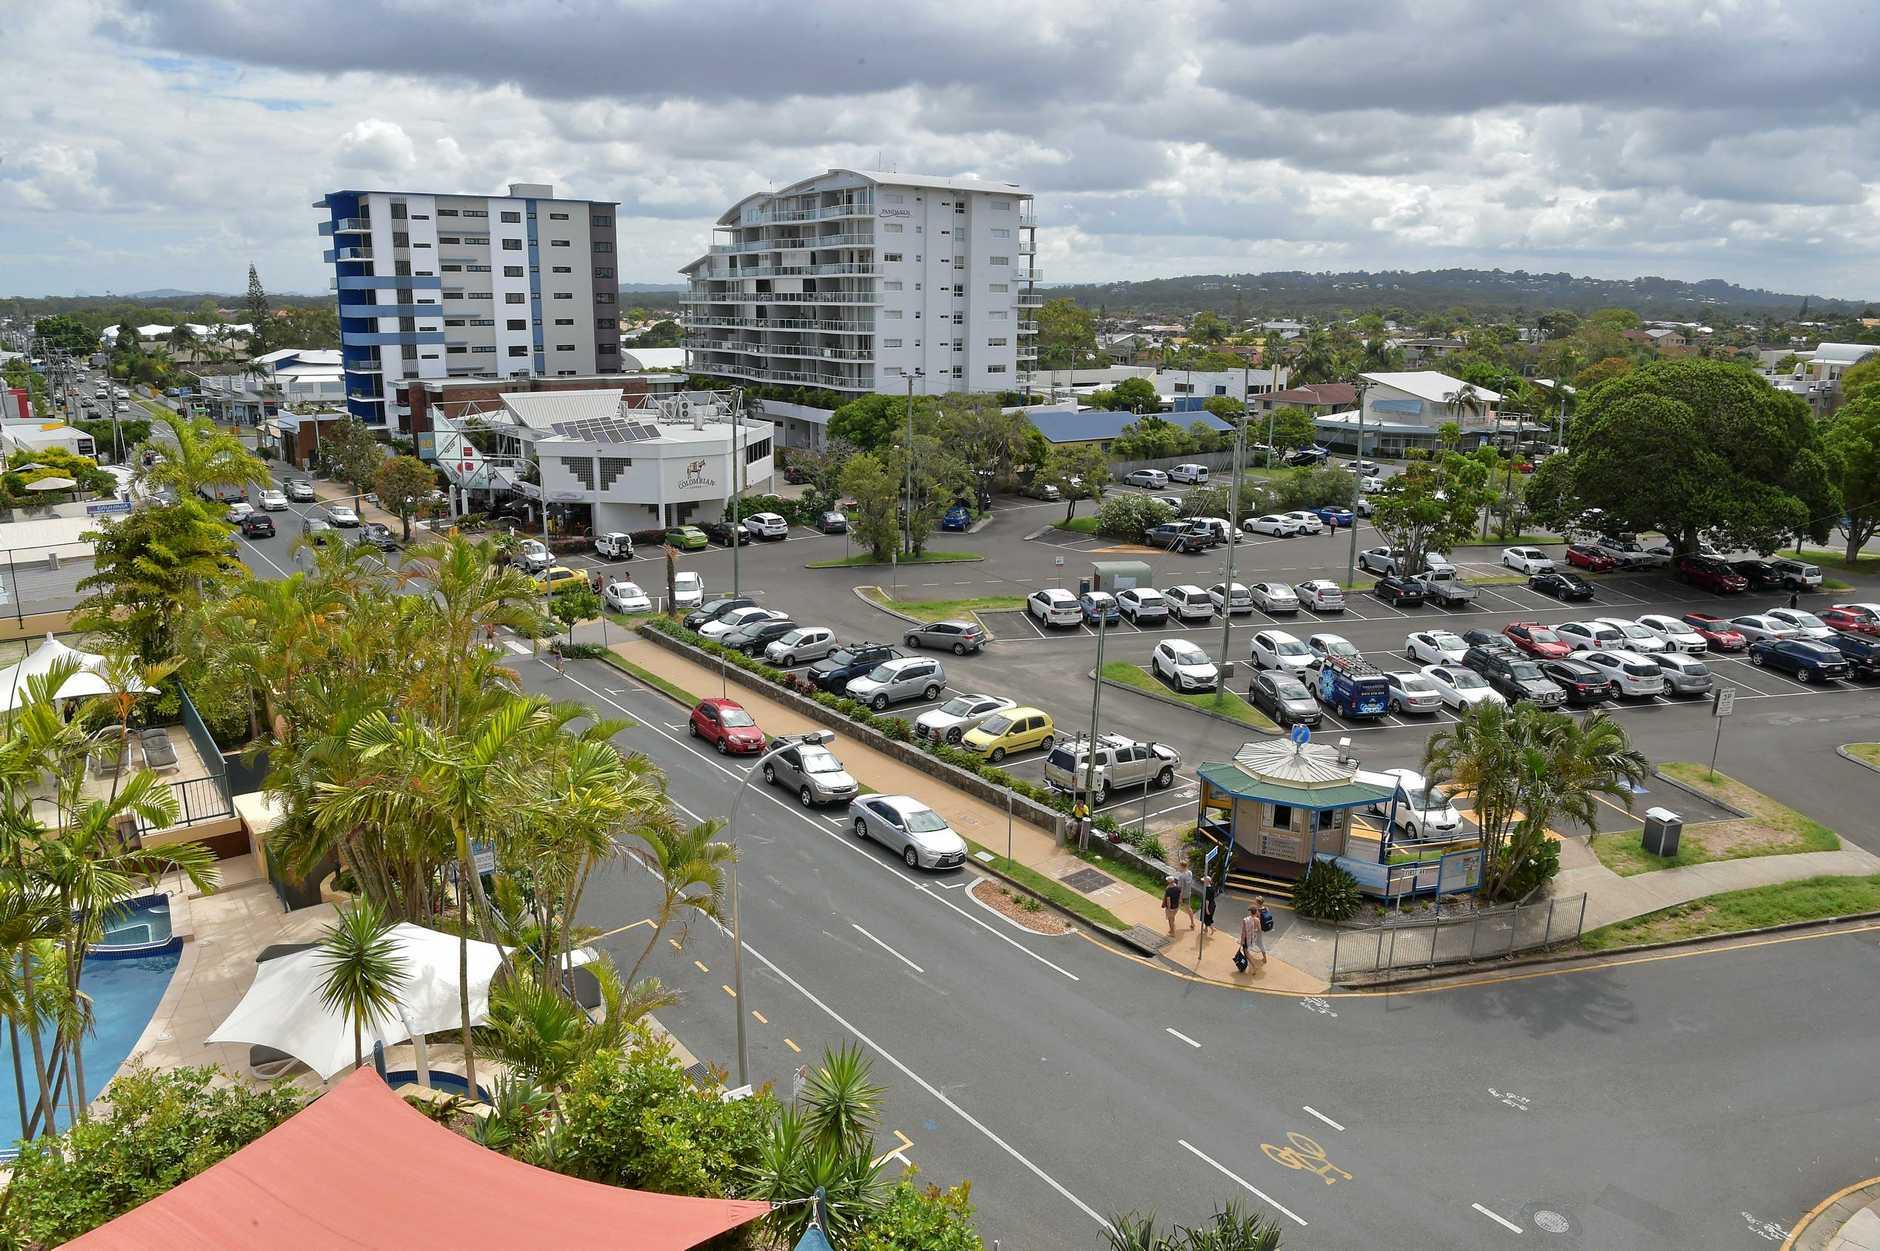 The Brisbane Road carpark at Mooloolaba.